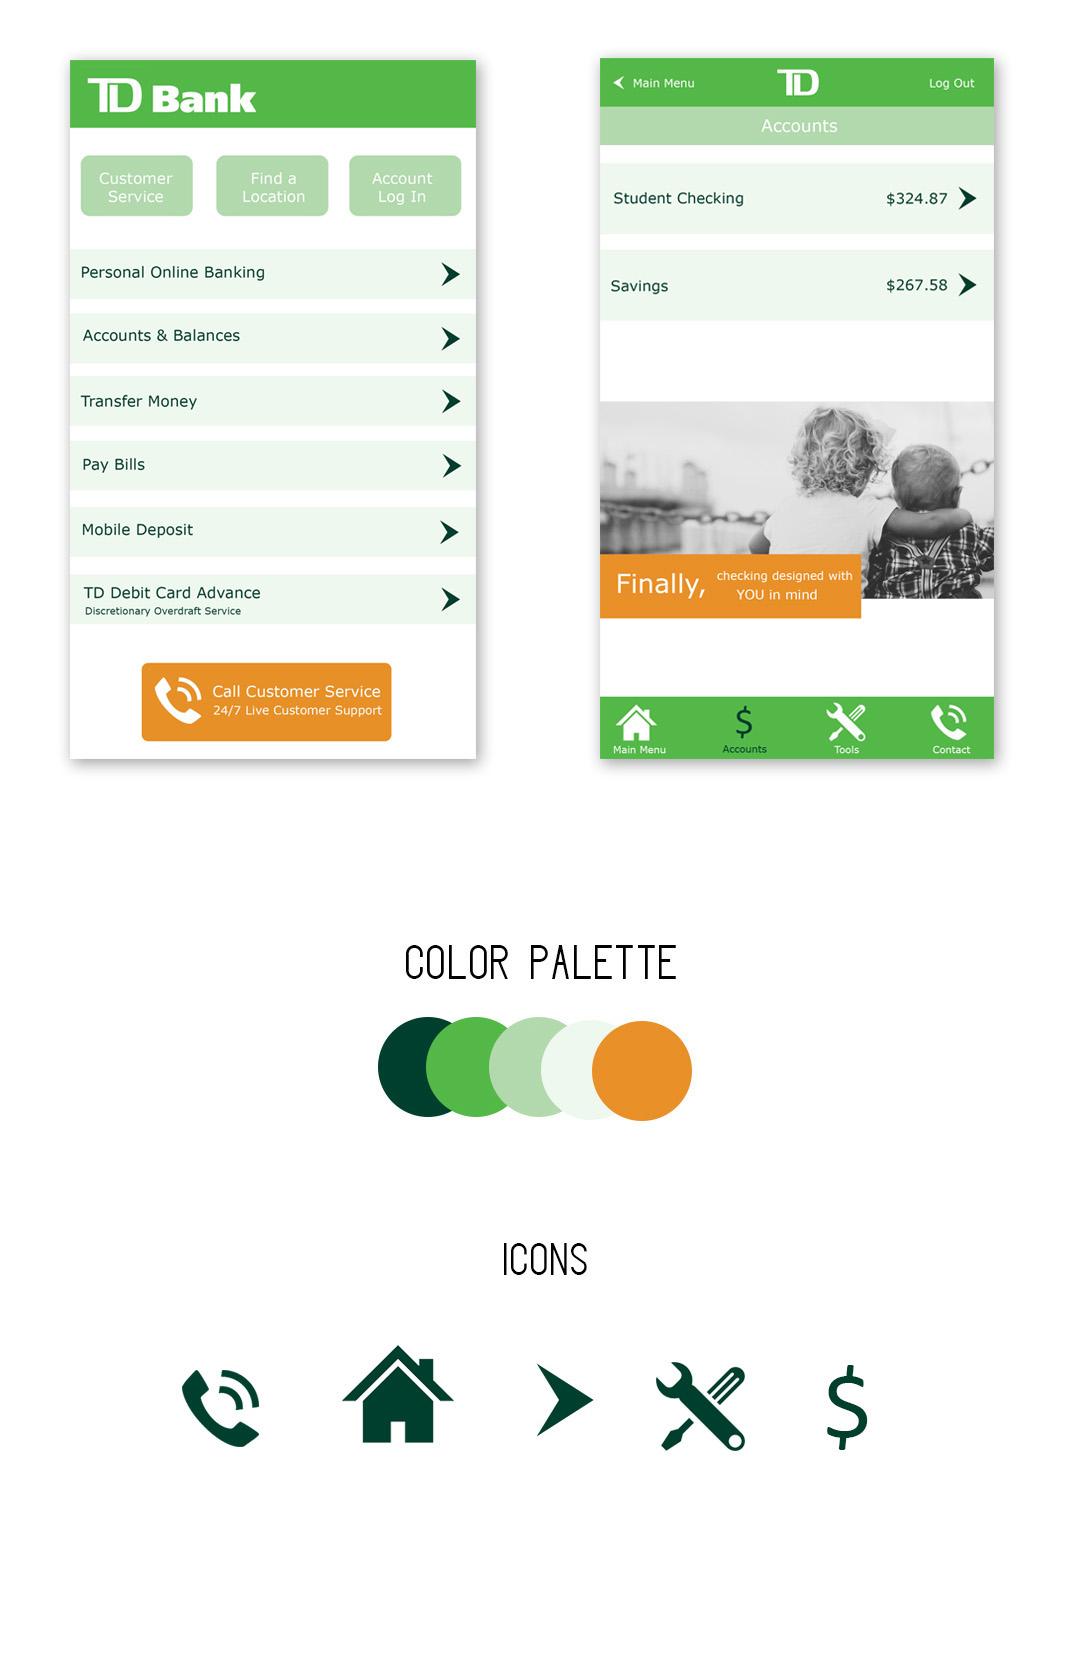 TD Bank Mobile App Redesign on Behance